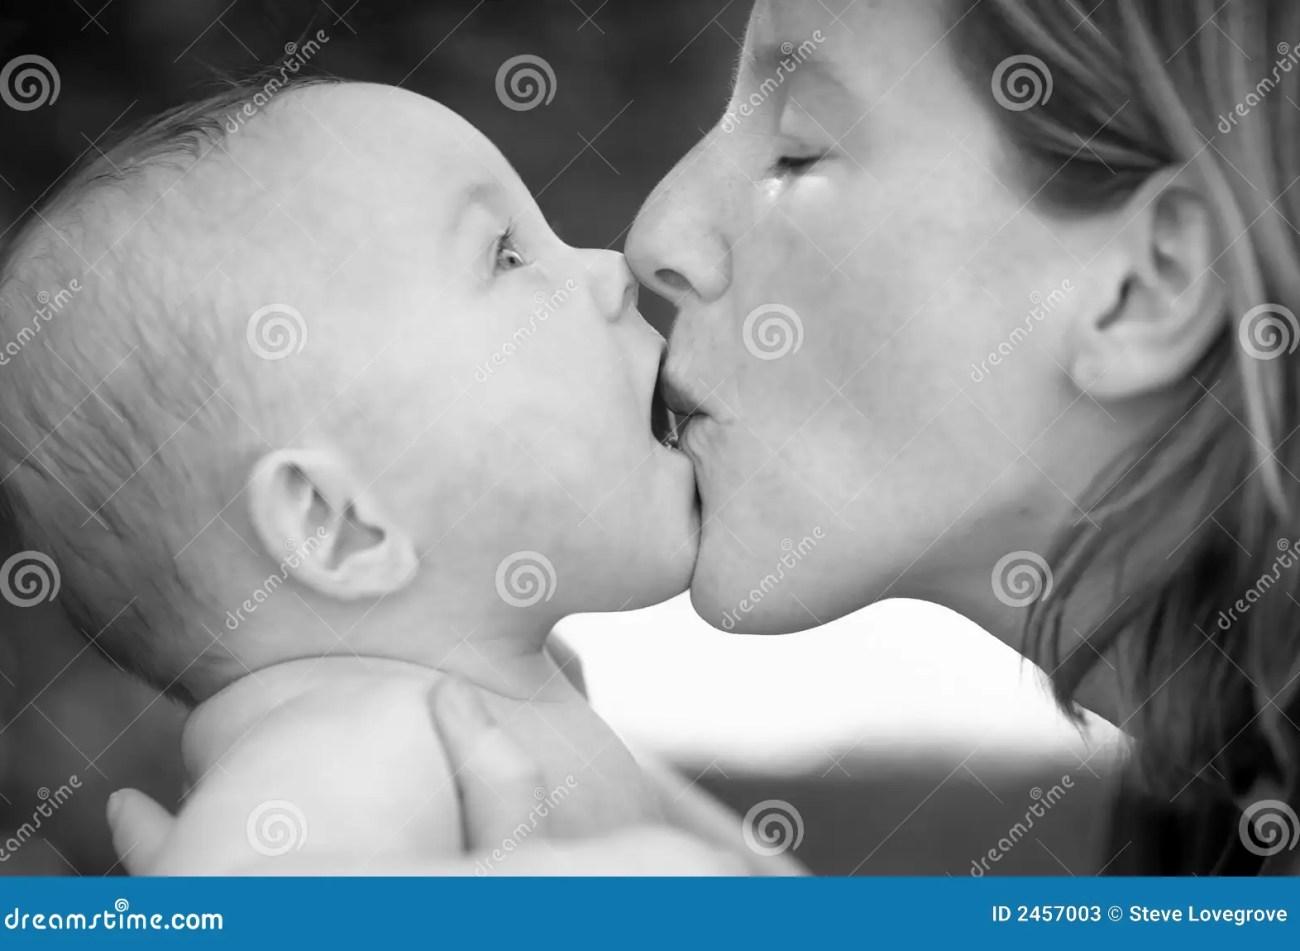 baby kiss stock photos - image: 2457003